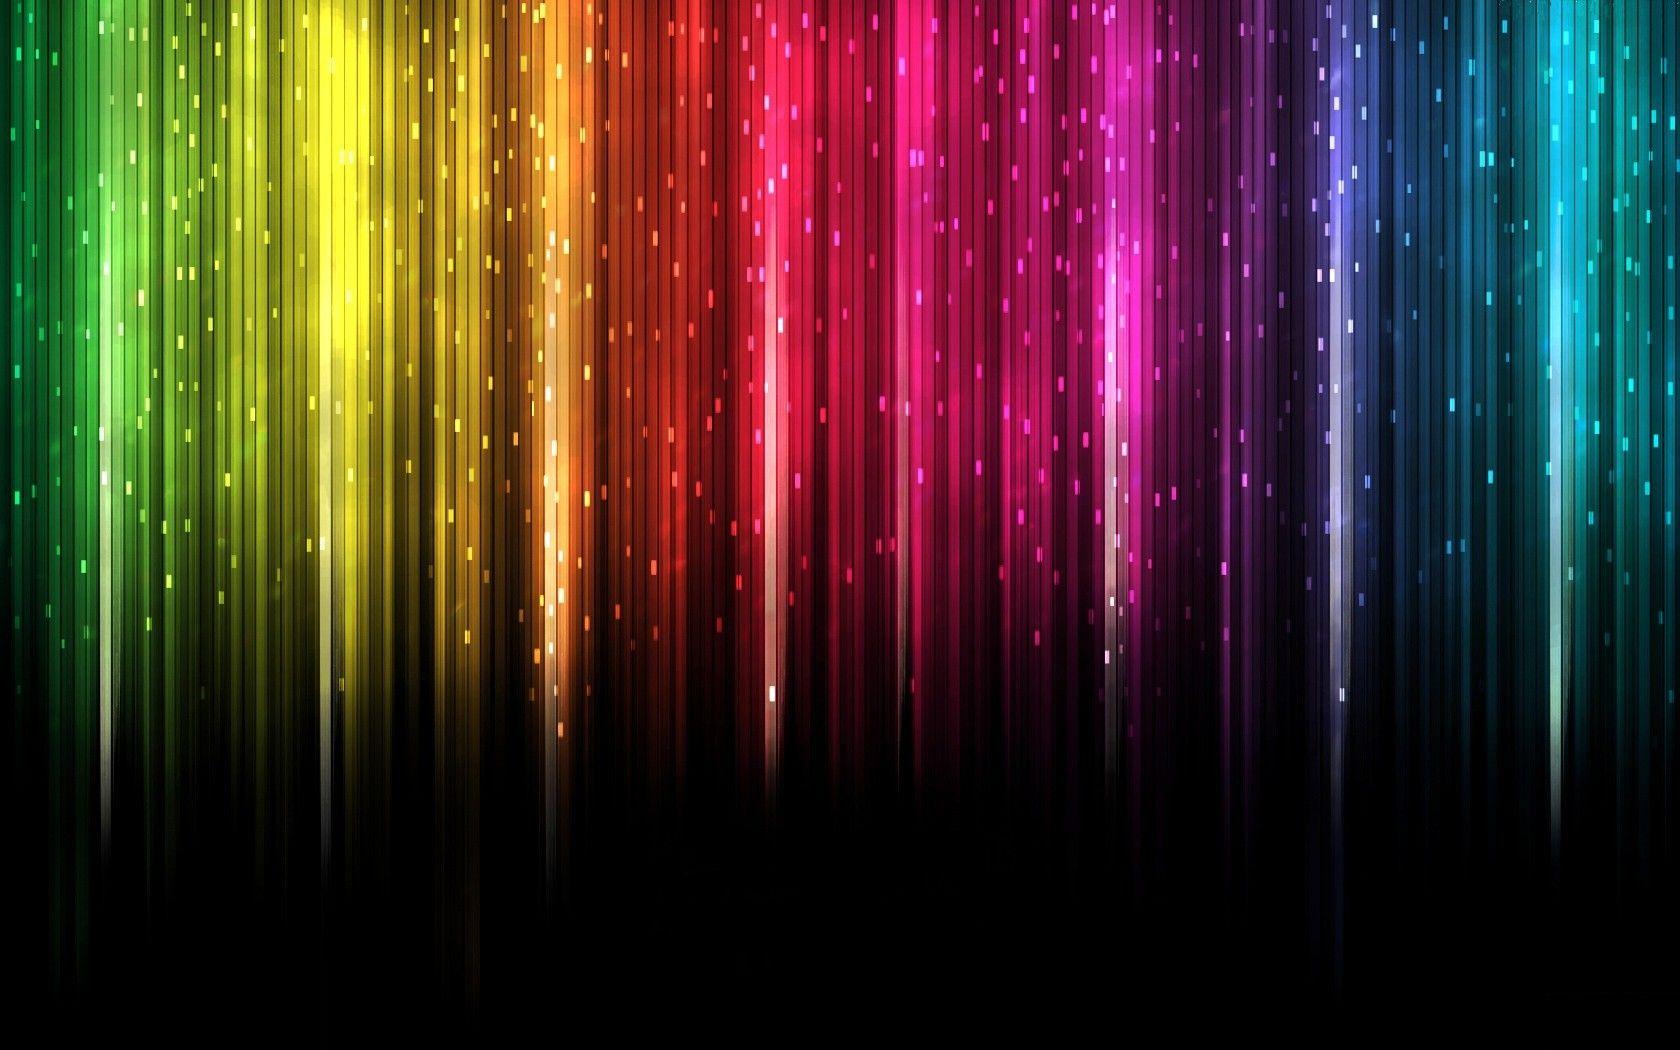 Wallpapers colors electrizante pentru vibrant electrical for Bright vibrant colors